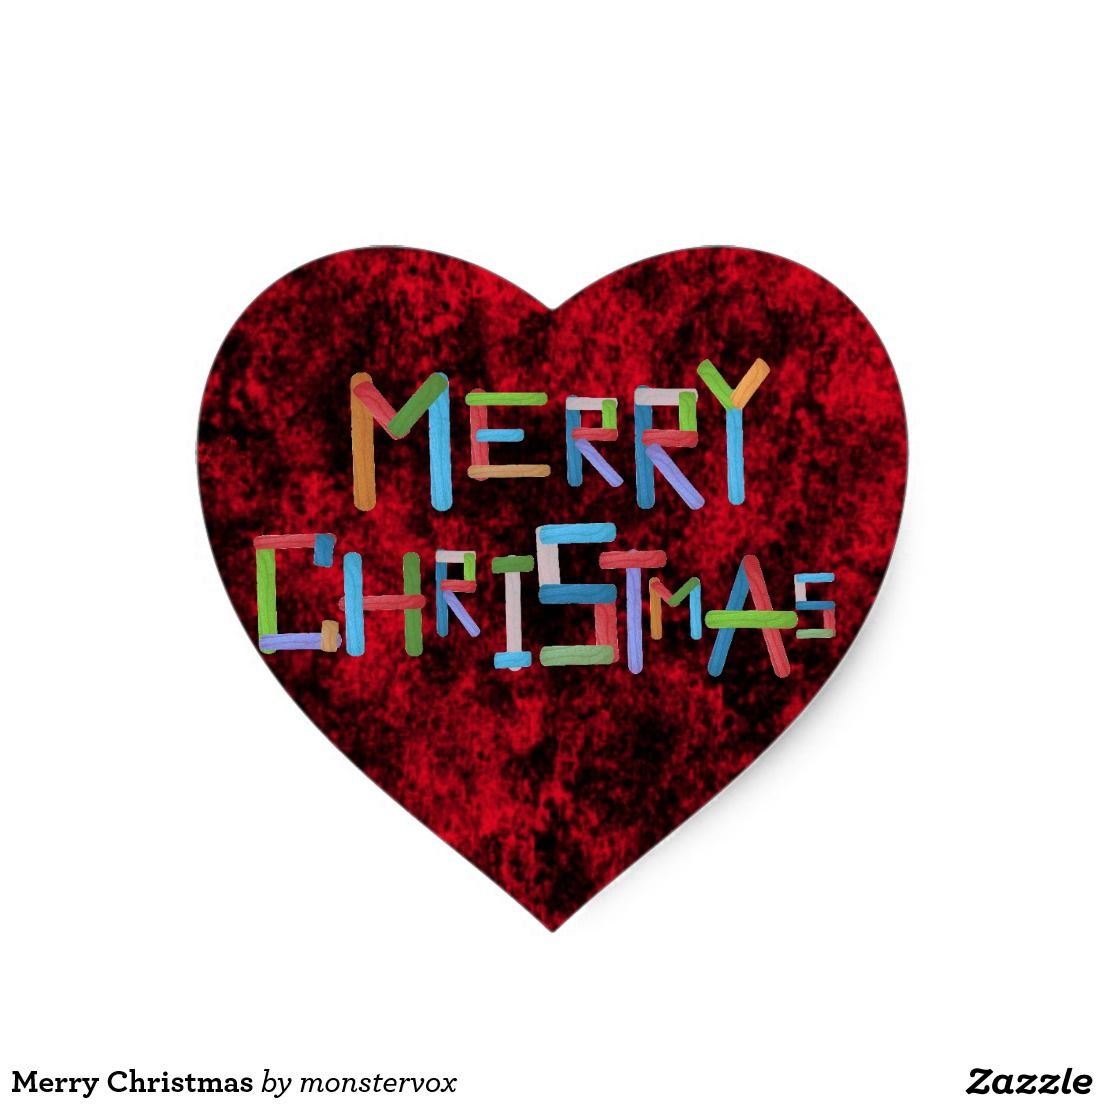 Merry Christmas Heart Sticker #MerryChristmas #Xmas #SantaClaus ...